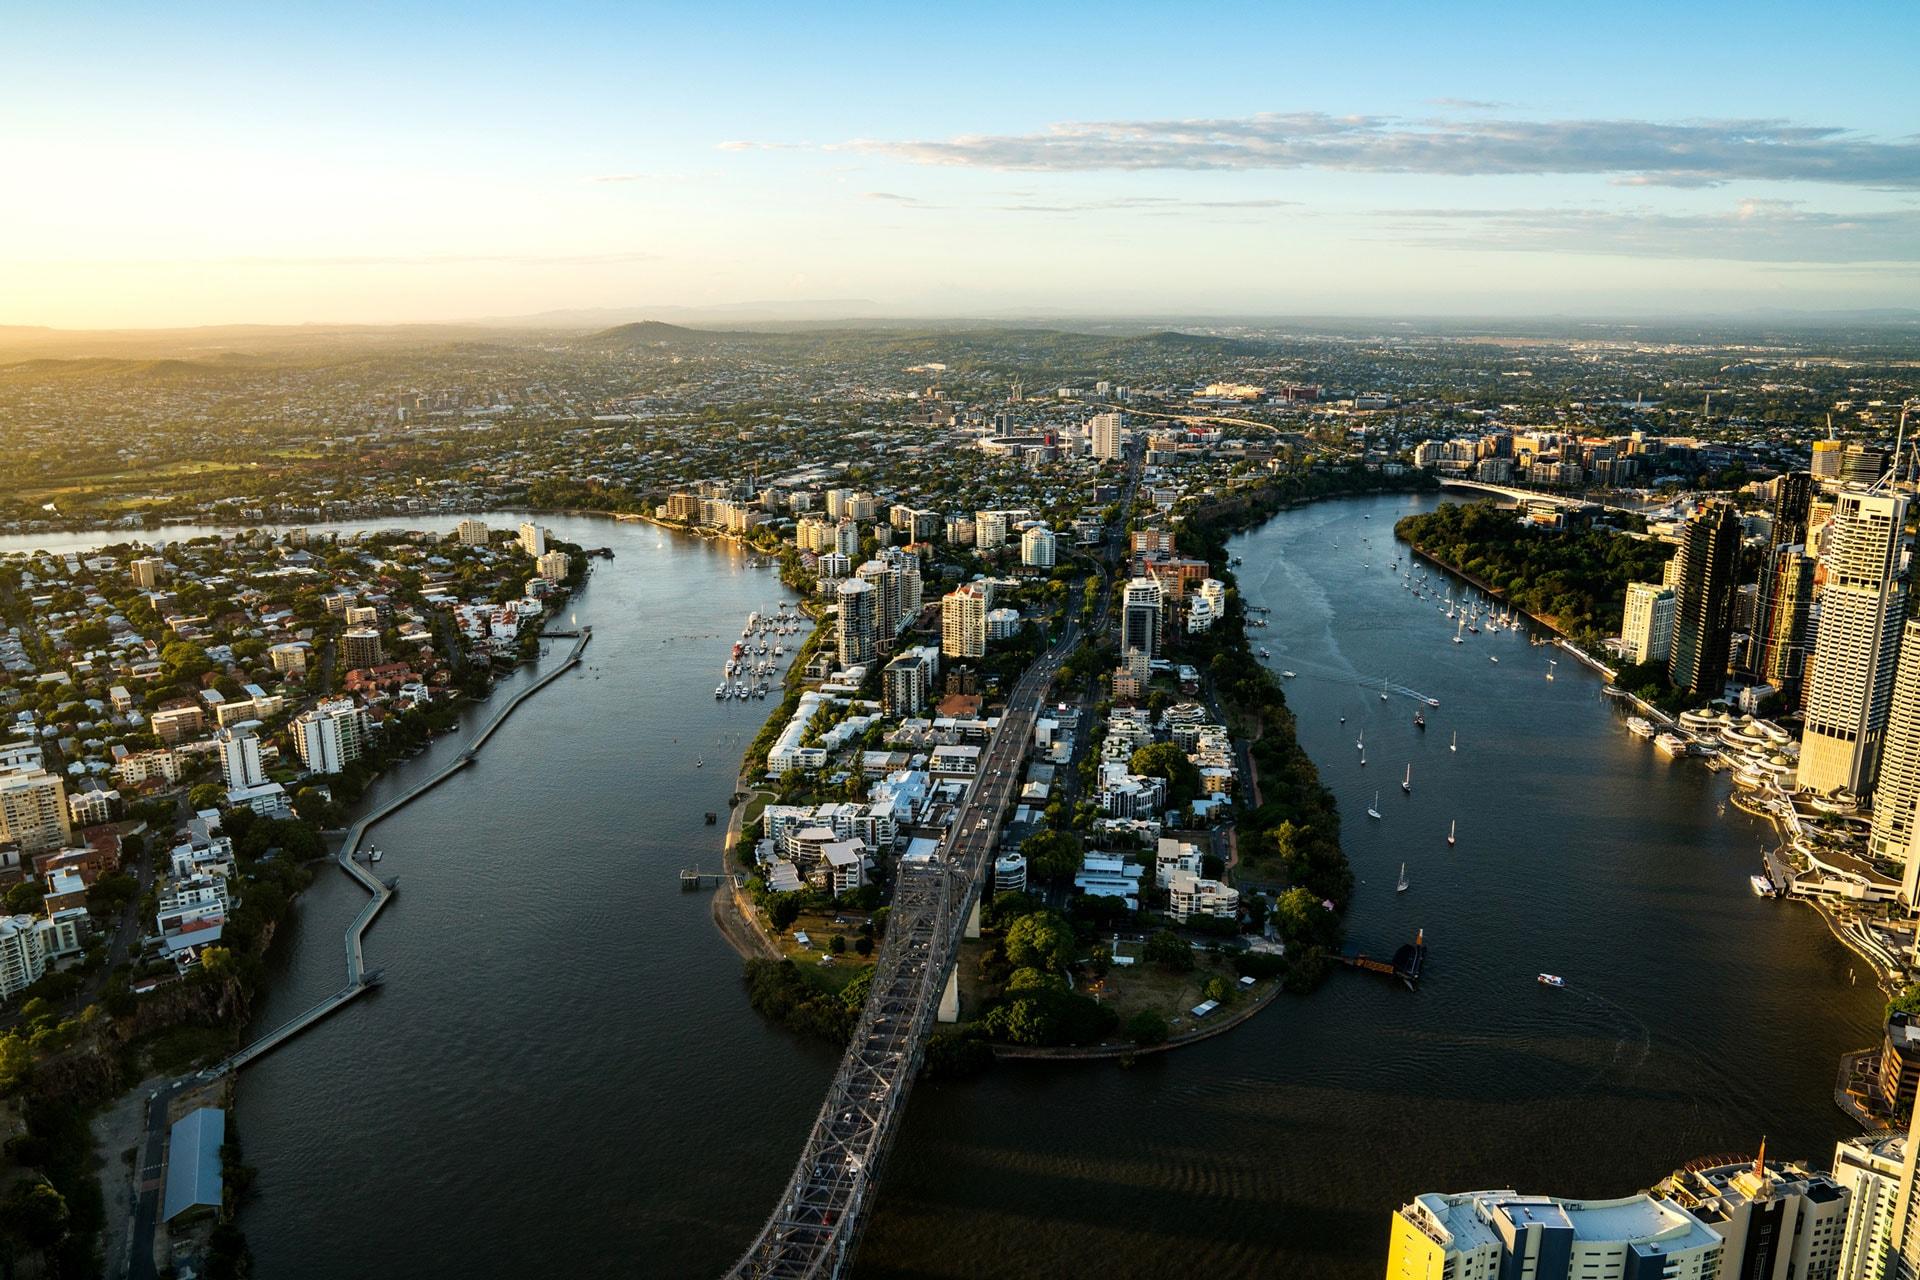 06-KangarooPointPeninsula-BrisbaneCityCouncil.jpg